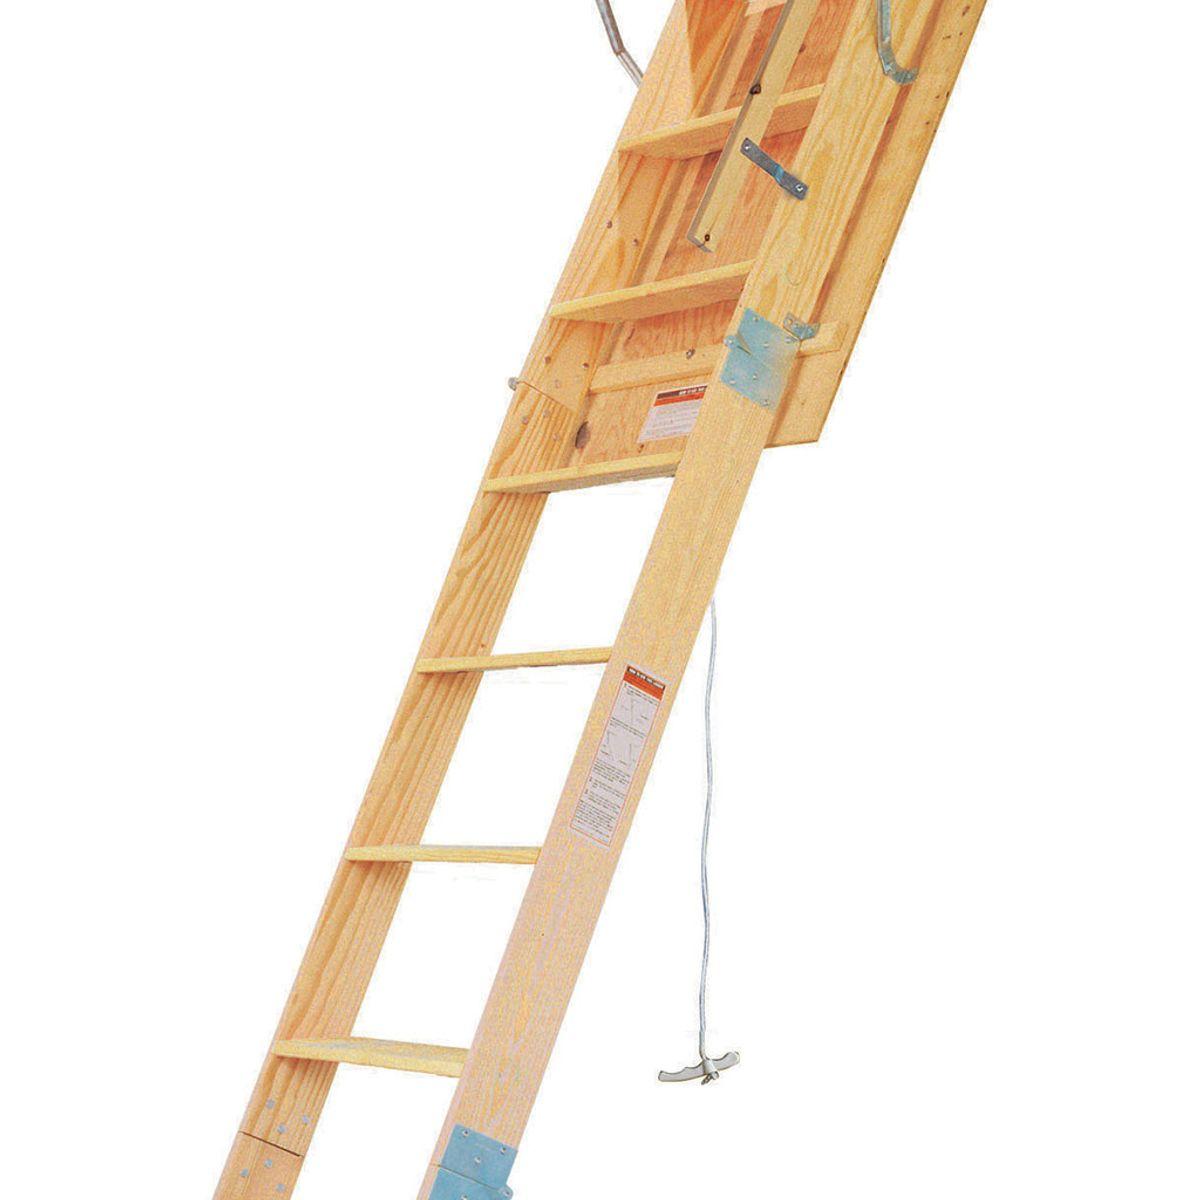 wh3008 305 in w x 54 in l x 8 ft h ceiling heavy duty wood